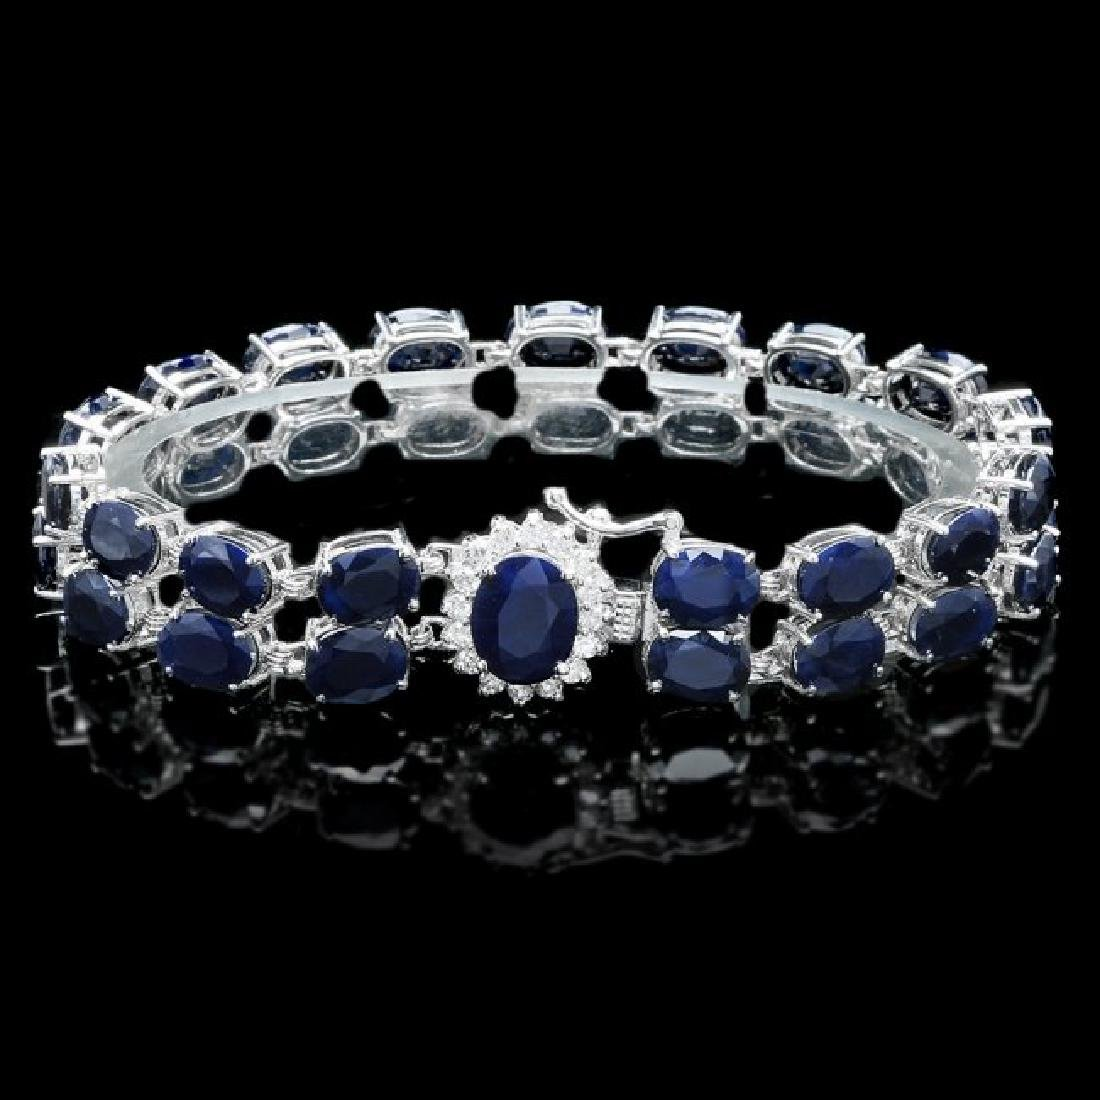 14k Gold 53.5ct Sapphire 0.55ct Diamond Bracelet